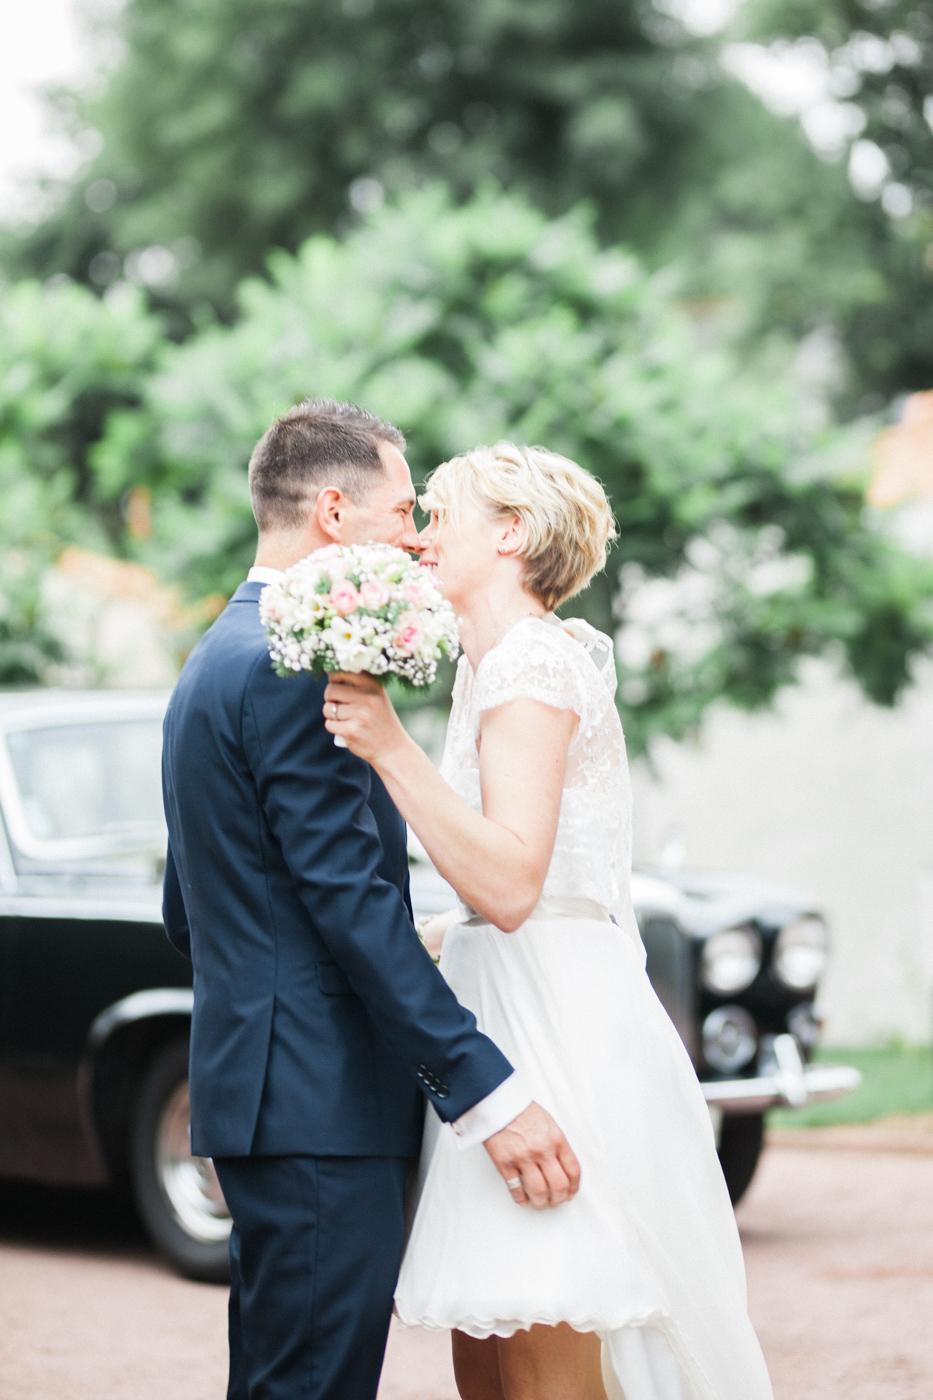 mariage cop-choux  mouzeil photographe orlane boisard château